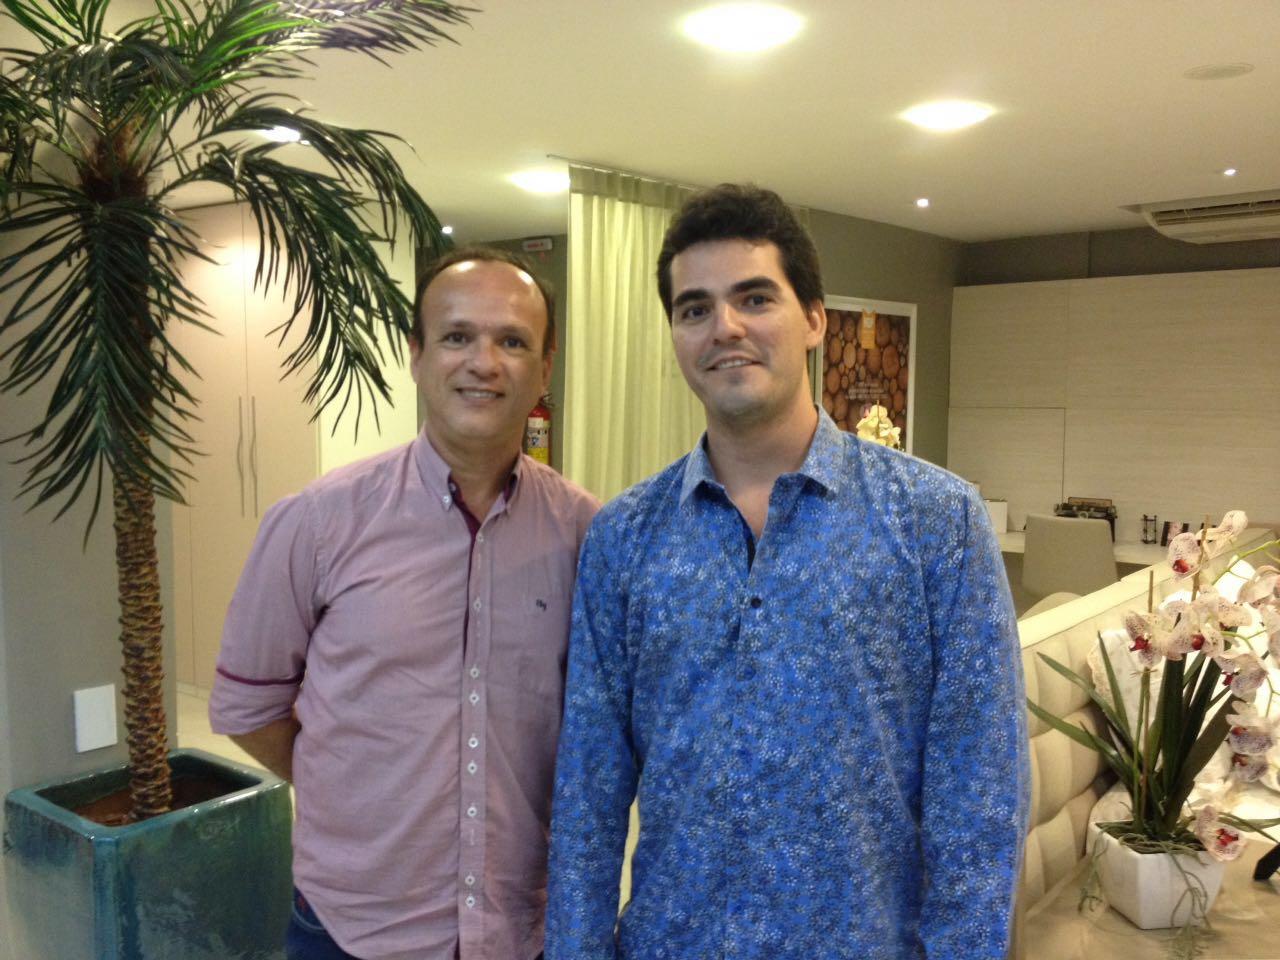 Elessandro Silva e Elissandro Matos.JPG